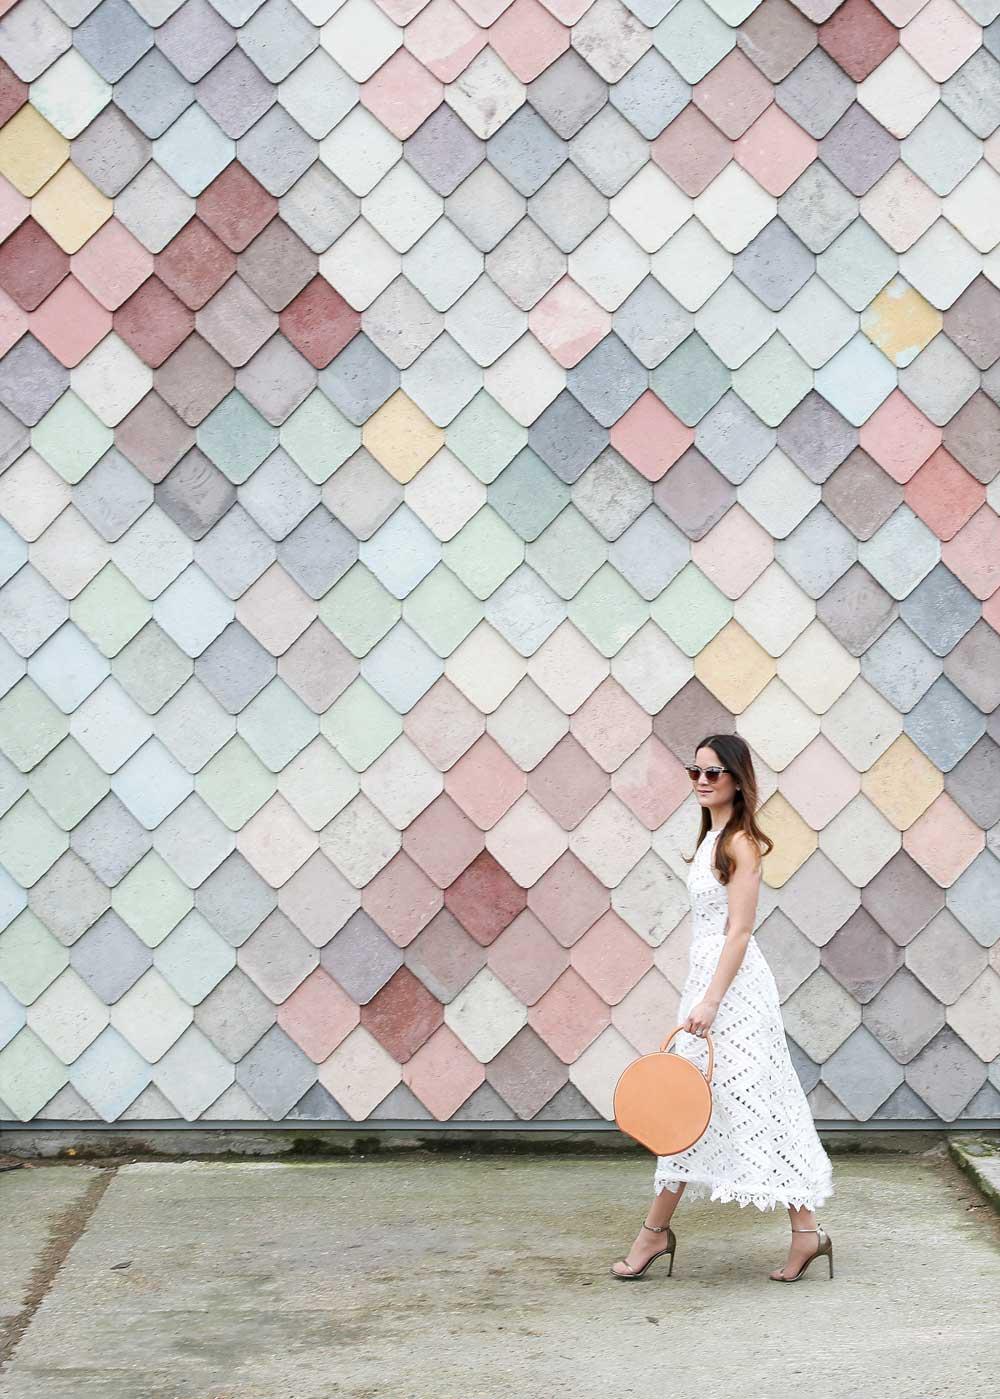 Colorful Tile Wall London